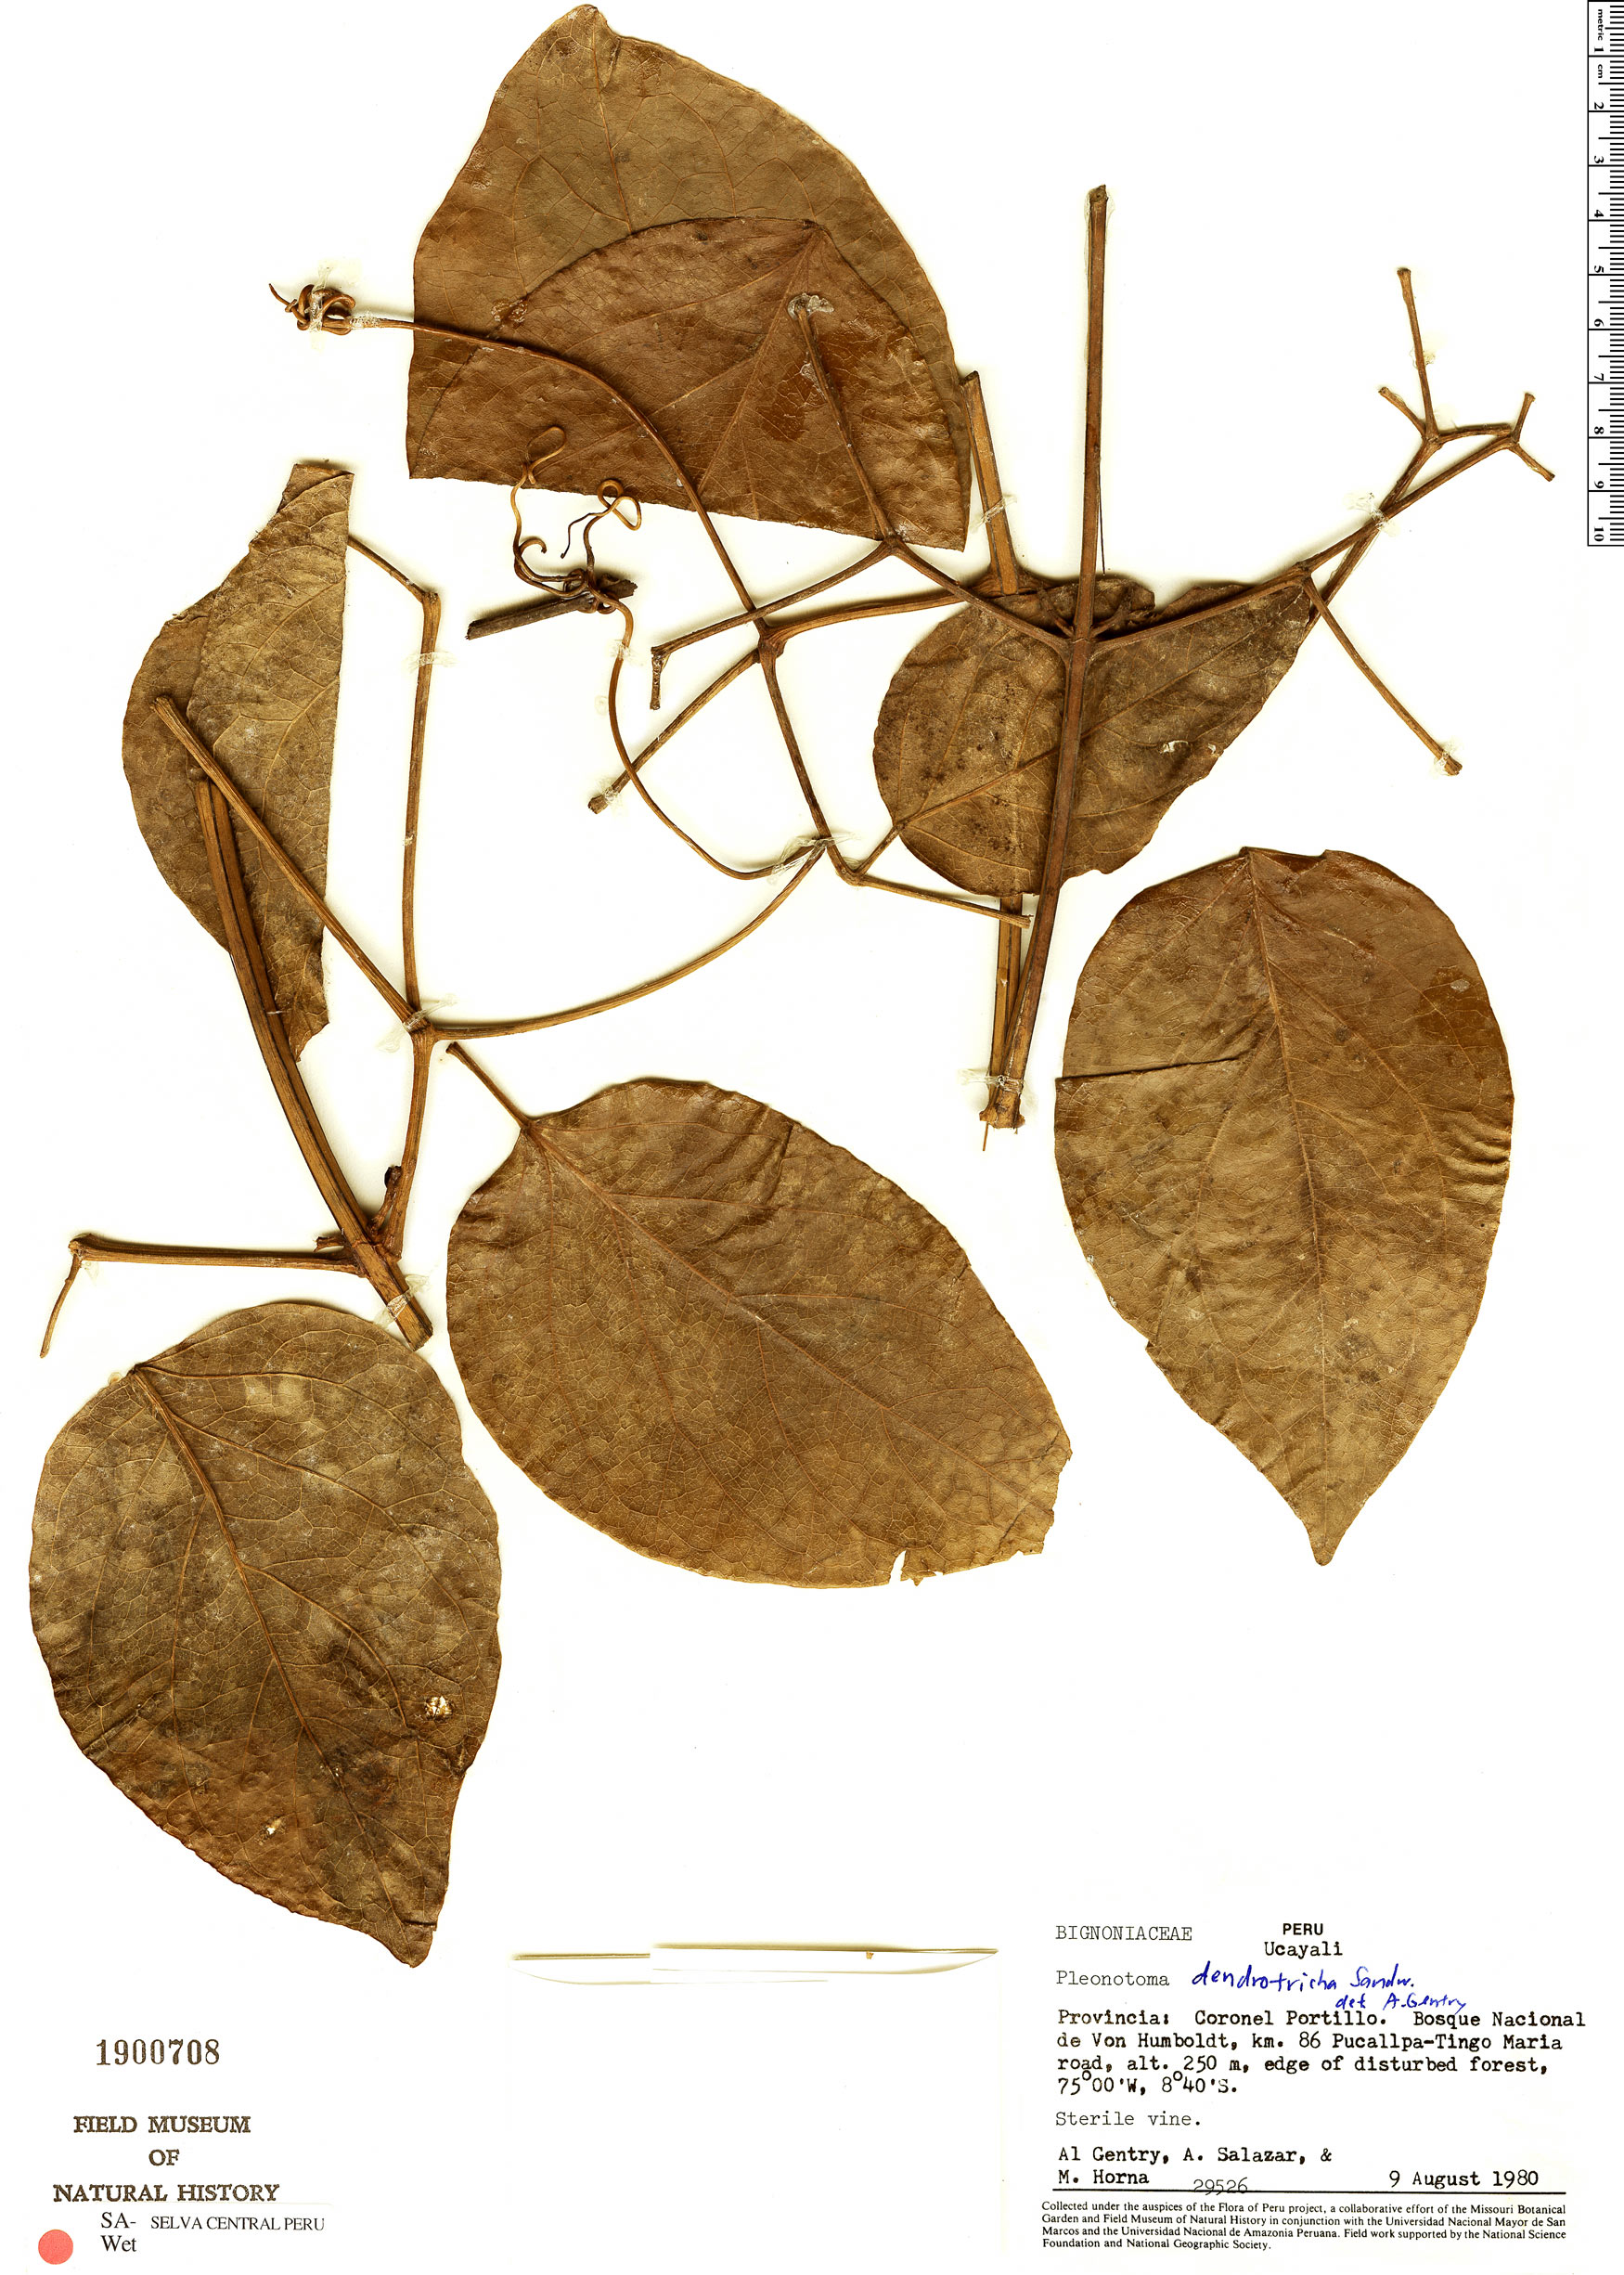 Espécime: Pleonotoma dendrotricha